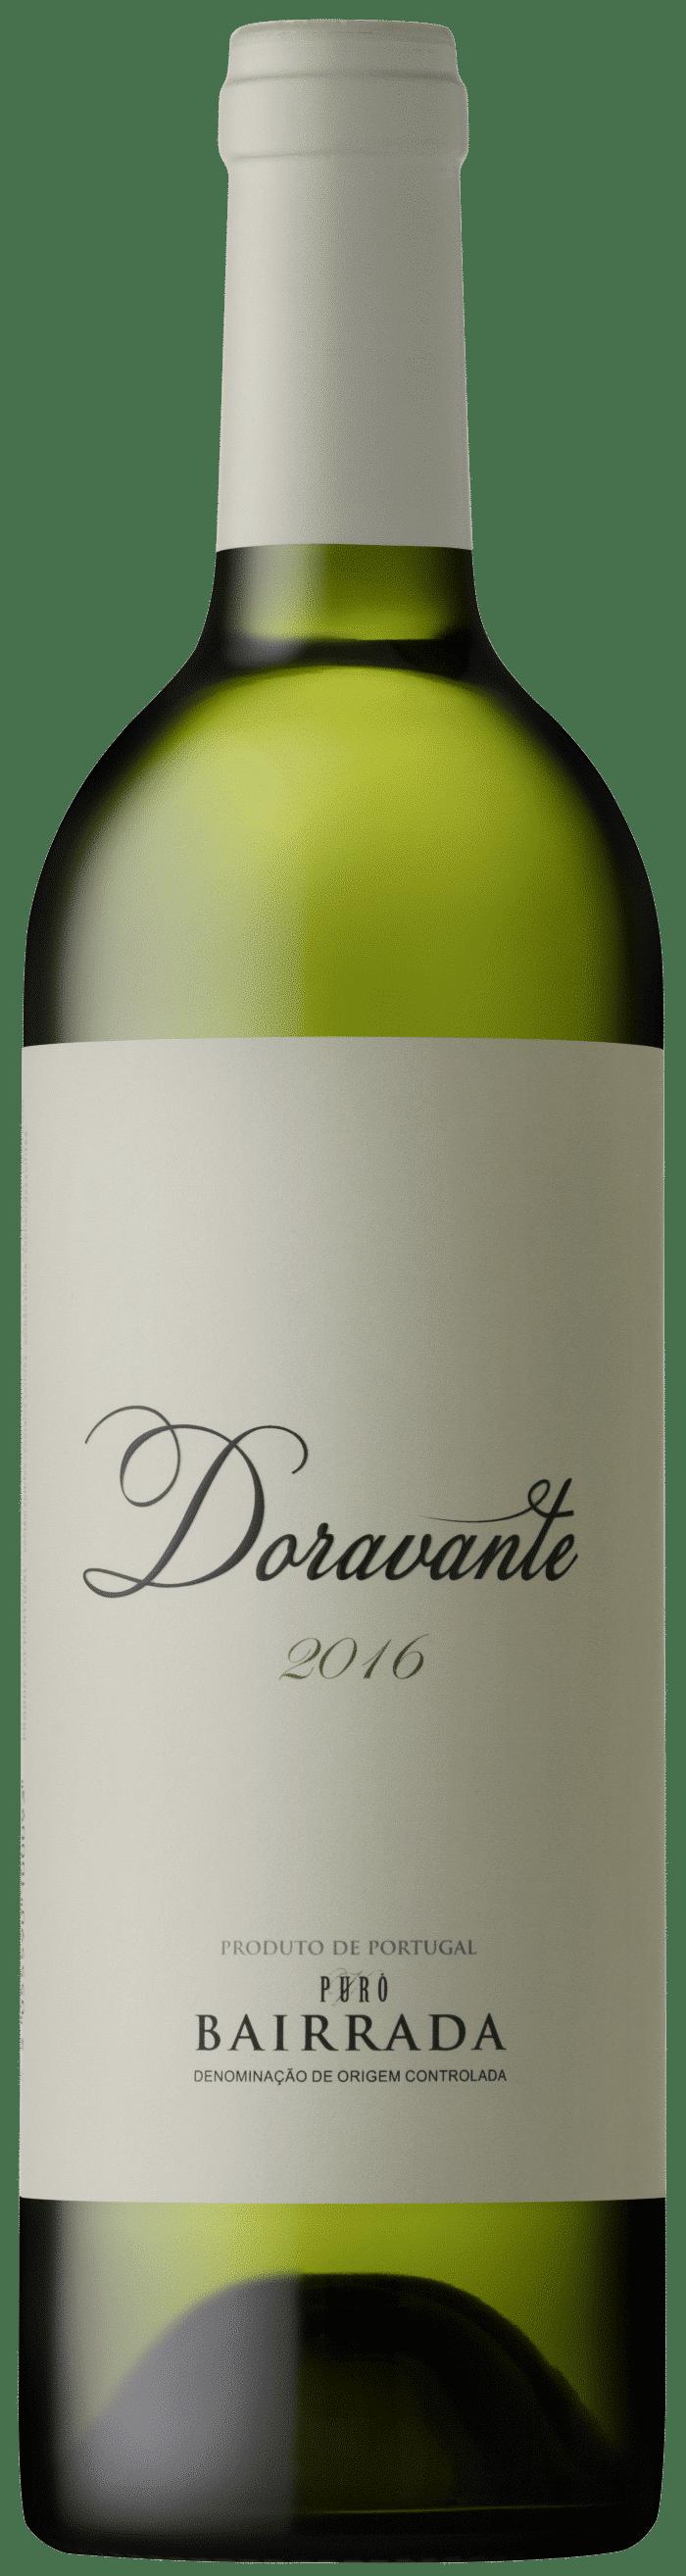 Doravante branco | Portugal | gemaakt van de druif: Arinto, Bical, Sercial